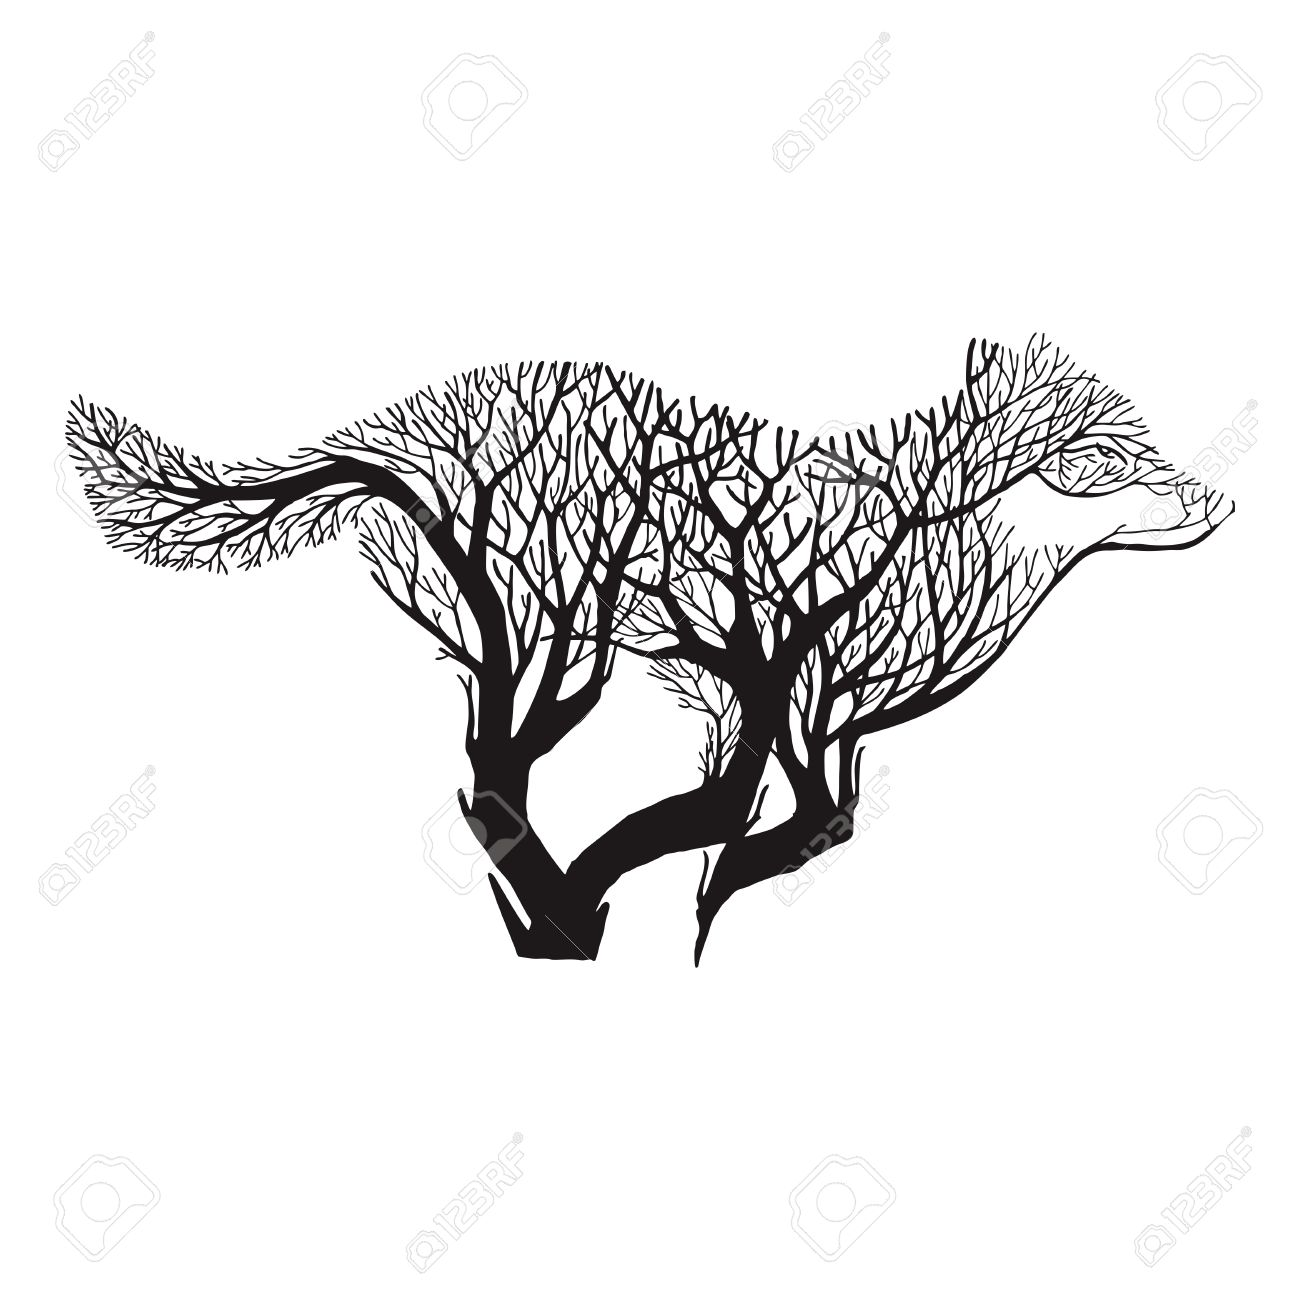 Wolf run blend tree drawing tattoo vector - 64296950